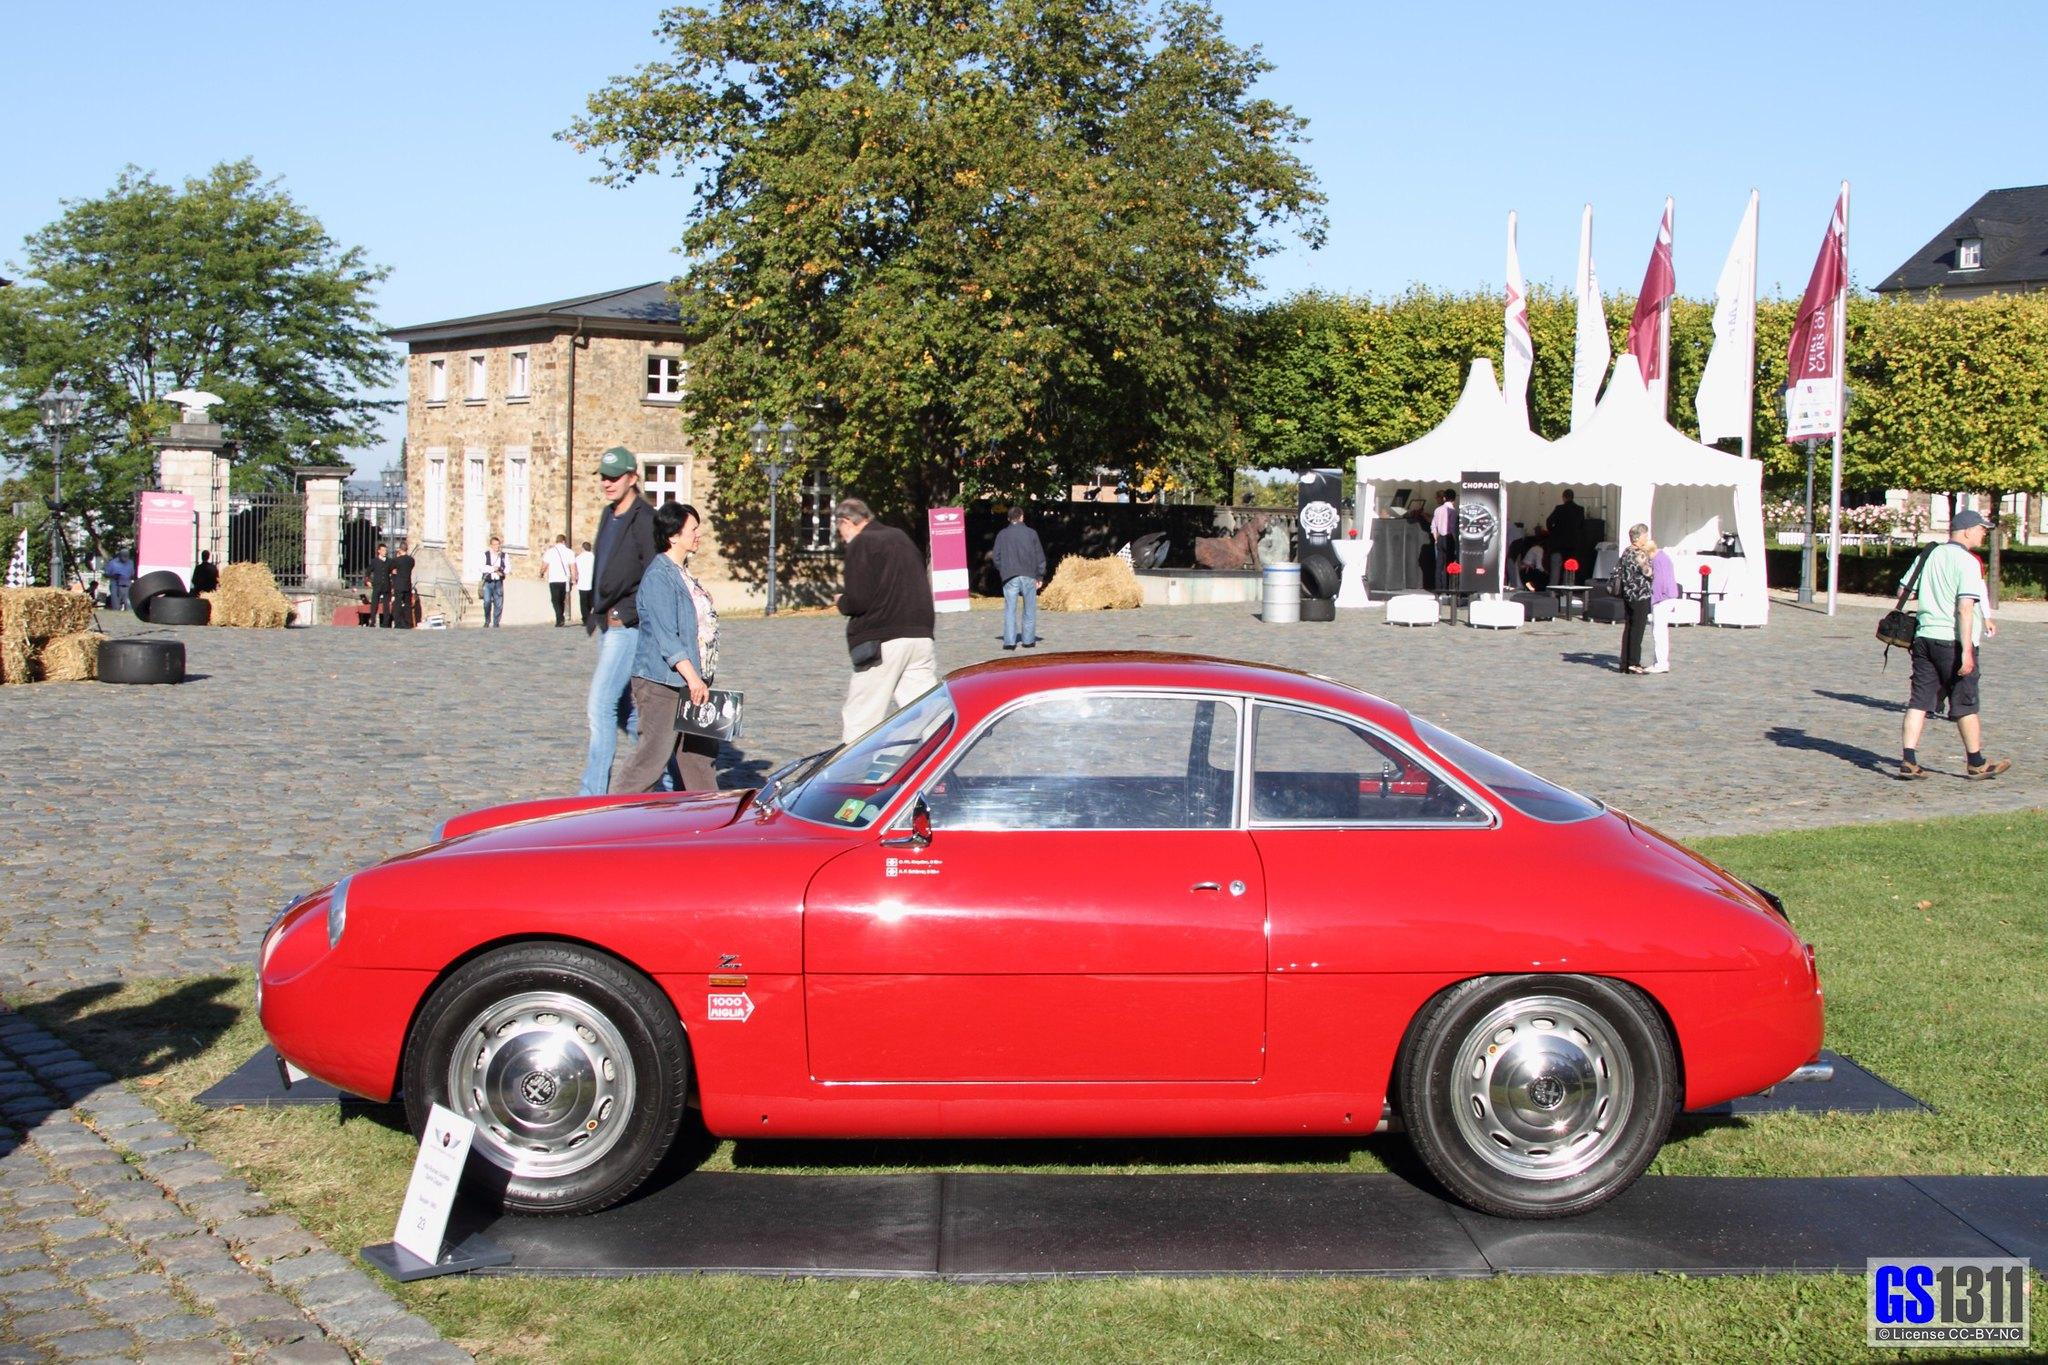 Used Sander Sprint Car Spindle